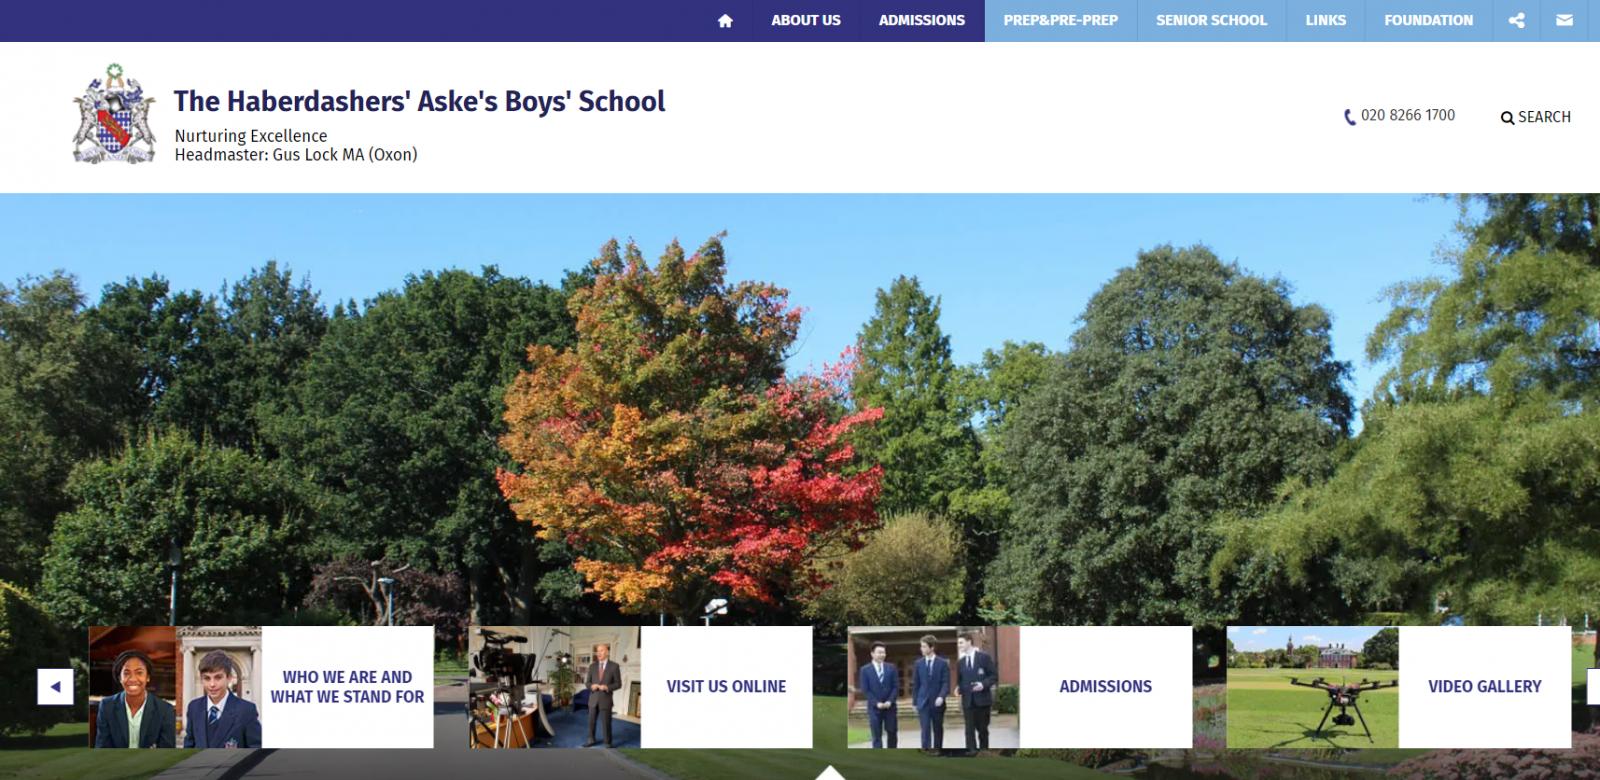 Haberdashers' Aske's Boys' School, Elstree